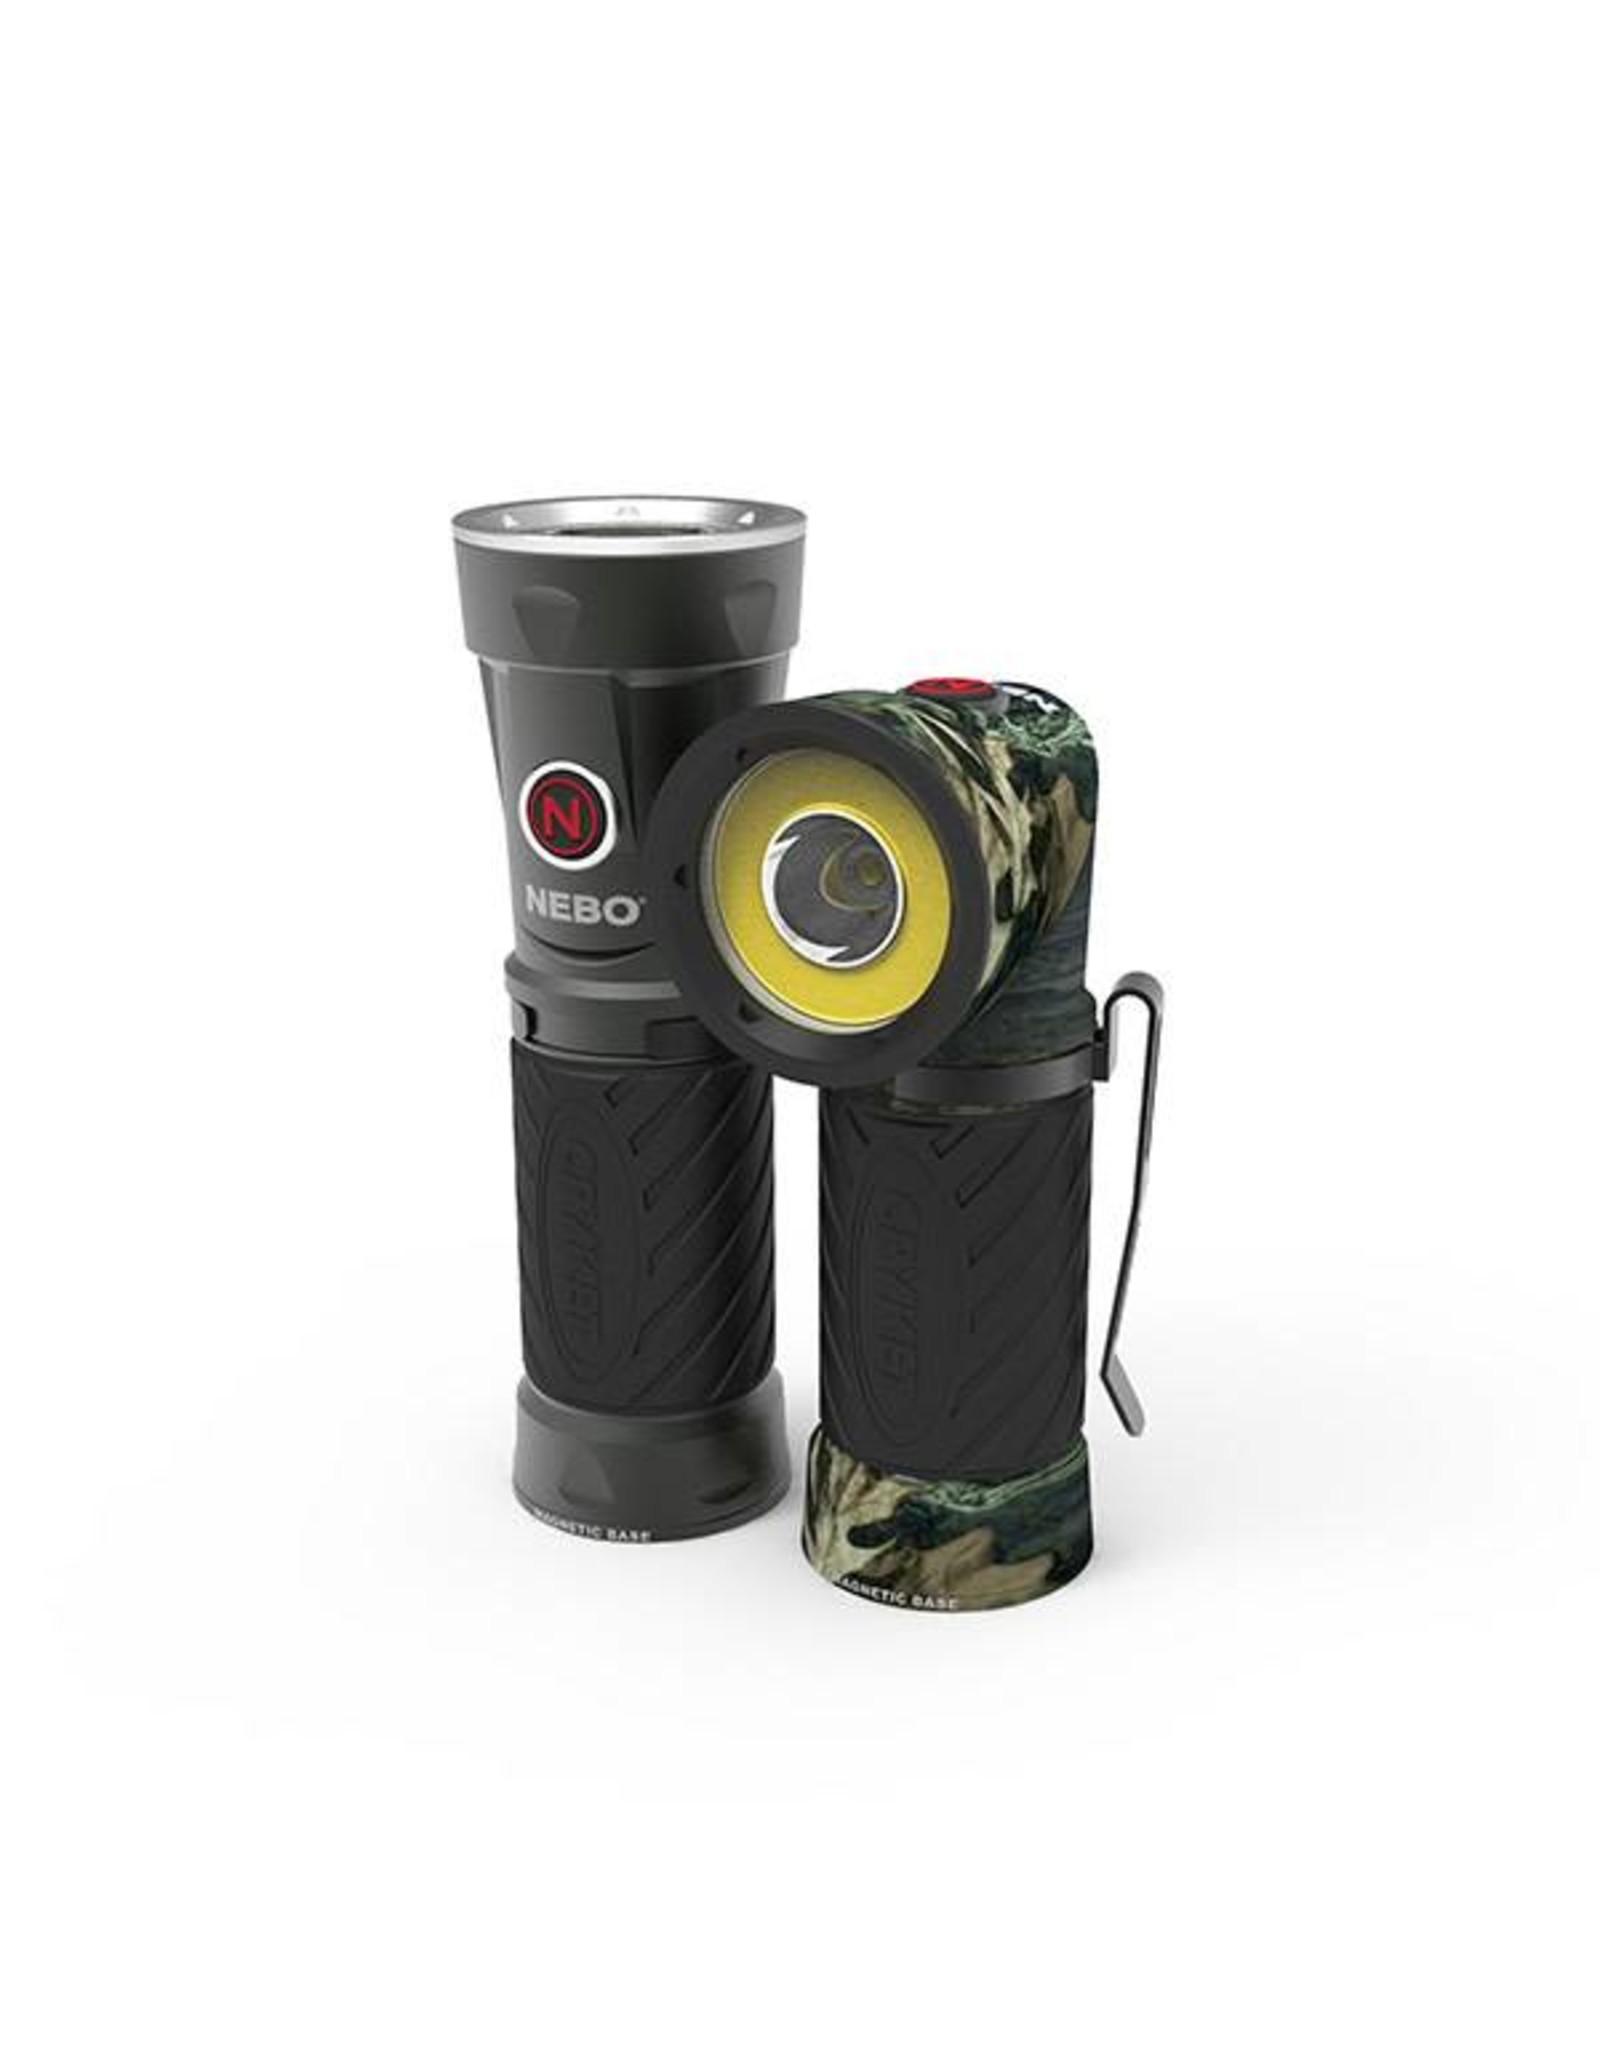 Nebo Cryket Cob Work & Spot Flashlight